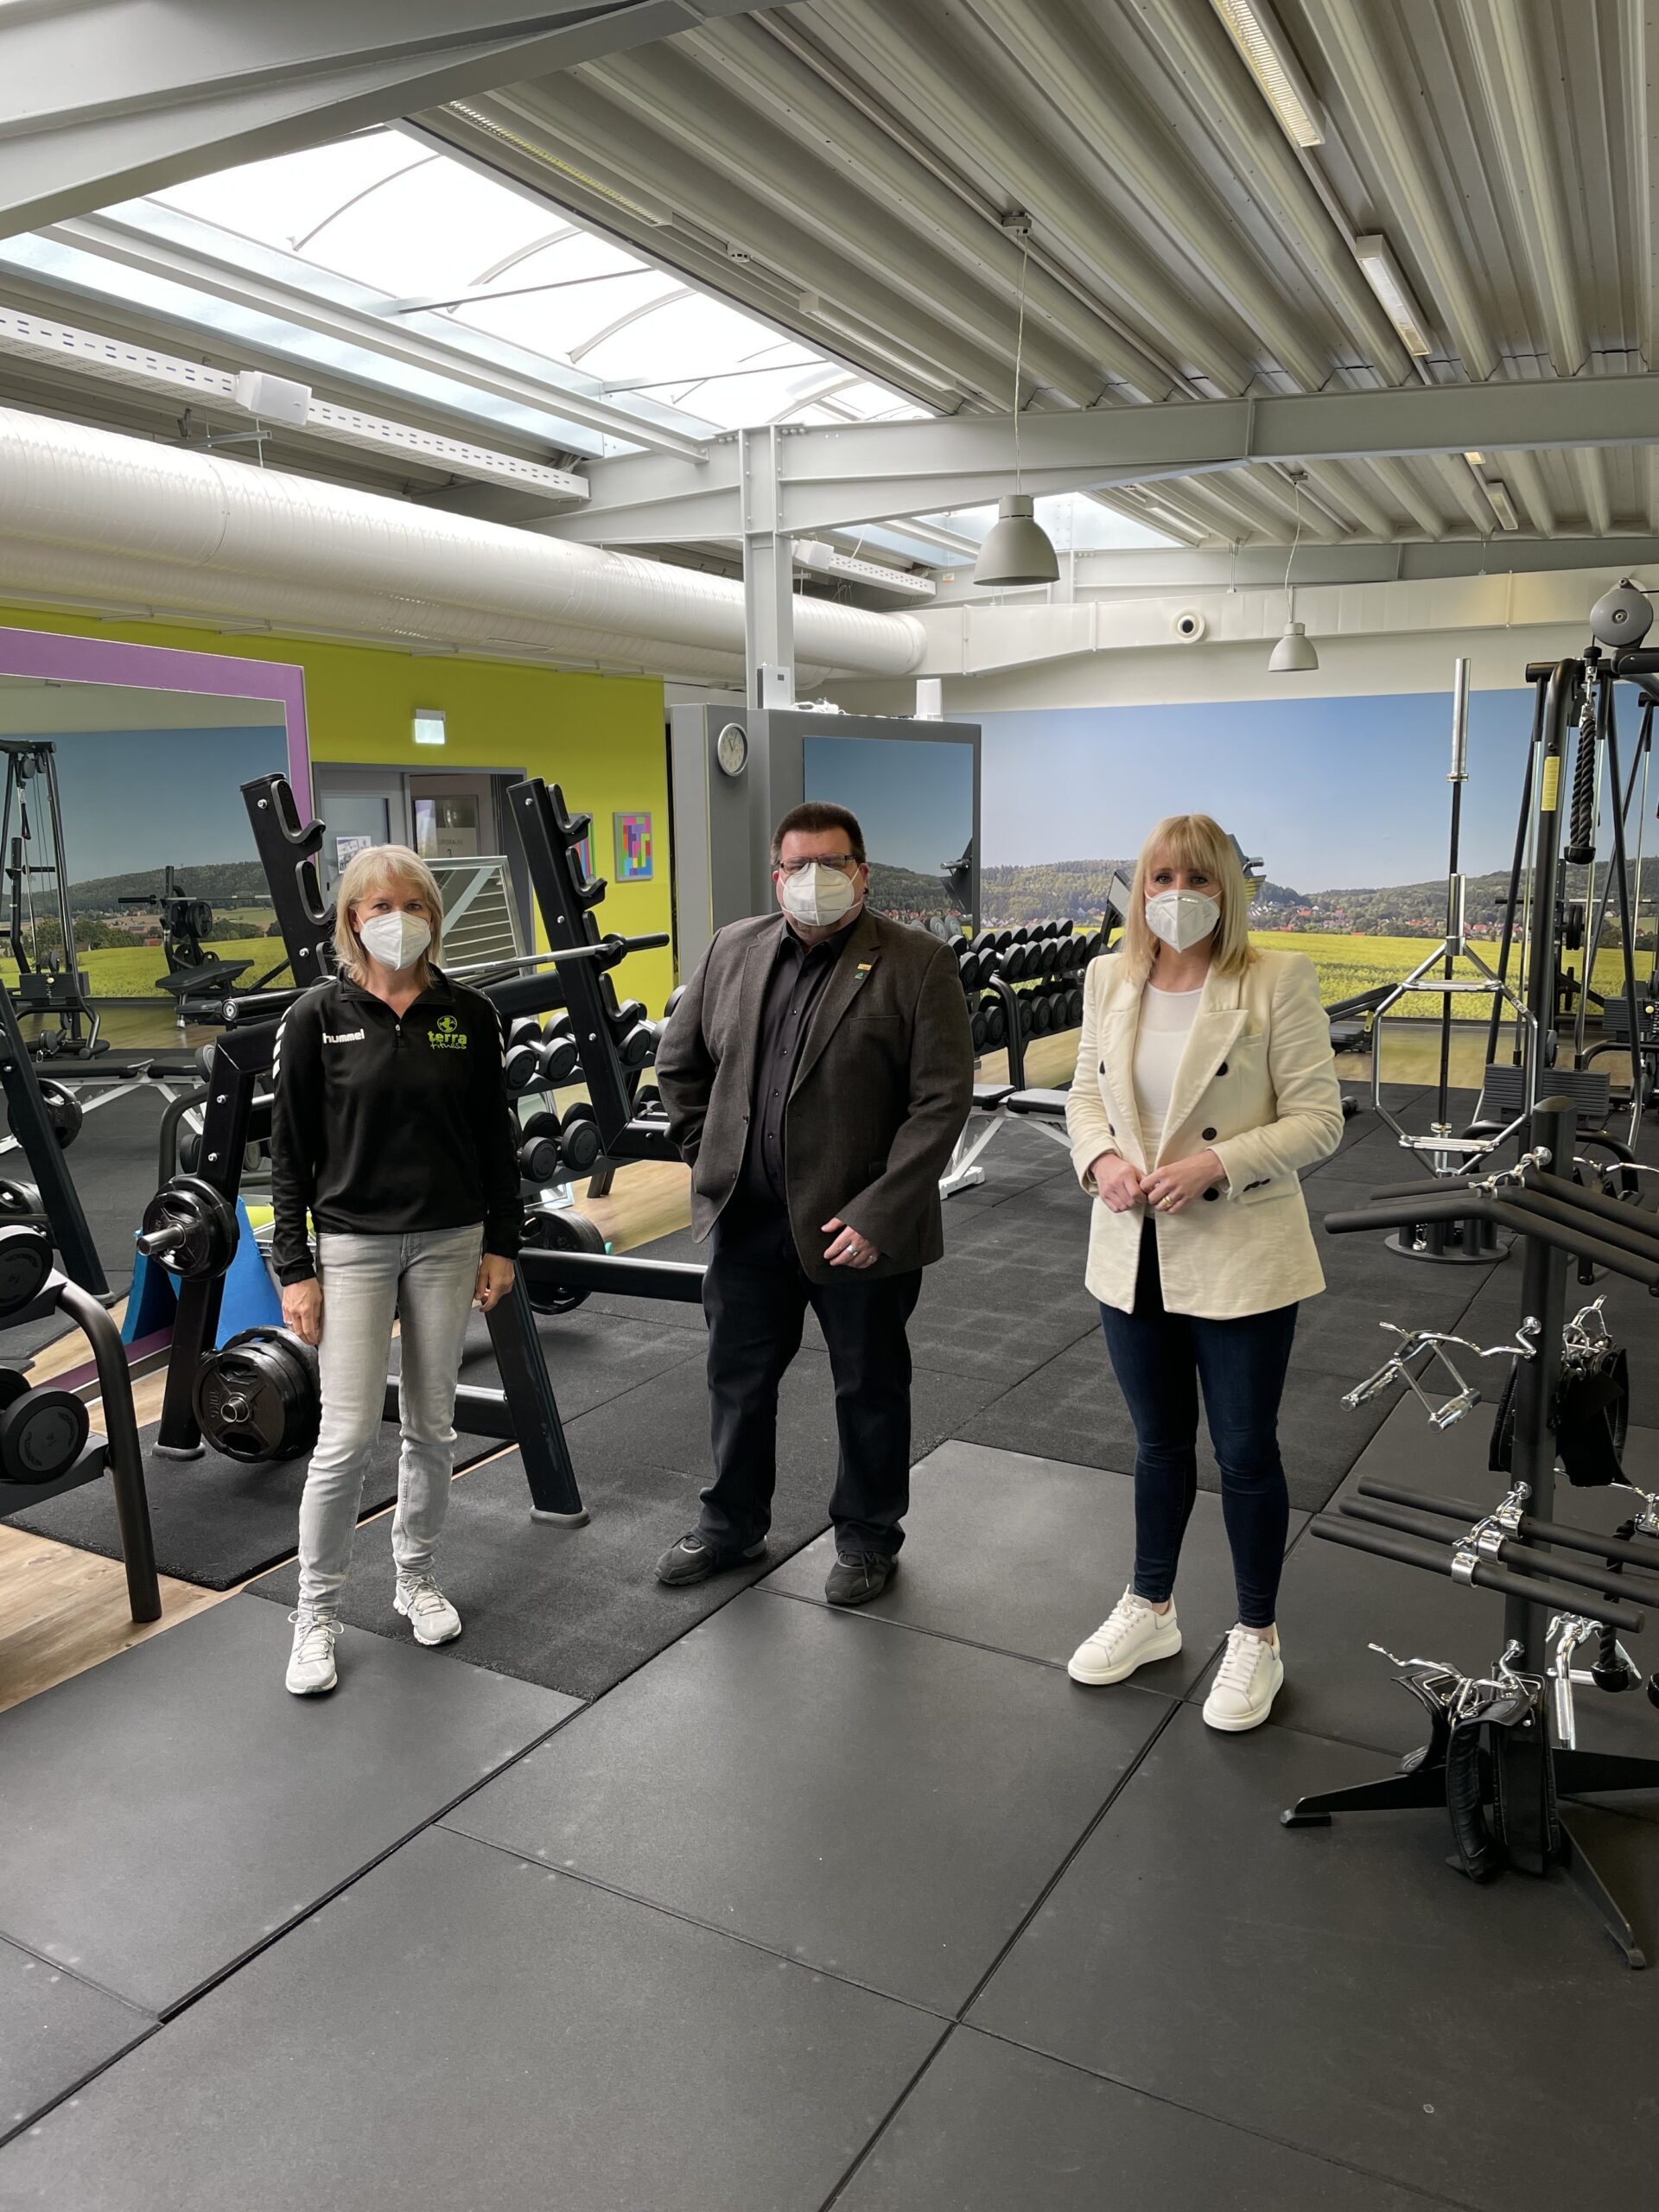 Foto: (v.l.n.r. Dorothea Kleine, Geschäftsführerin Terra Fitness GmbH, Andreas Sand, Daniela Beihl)